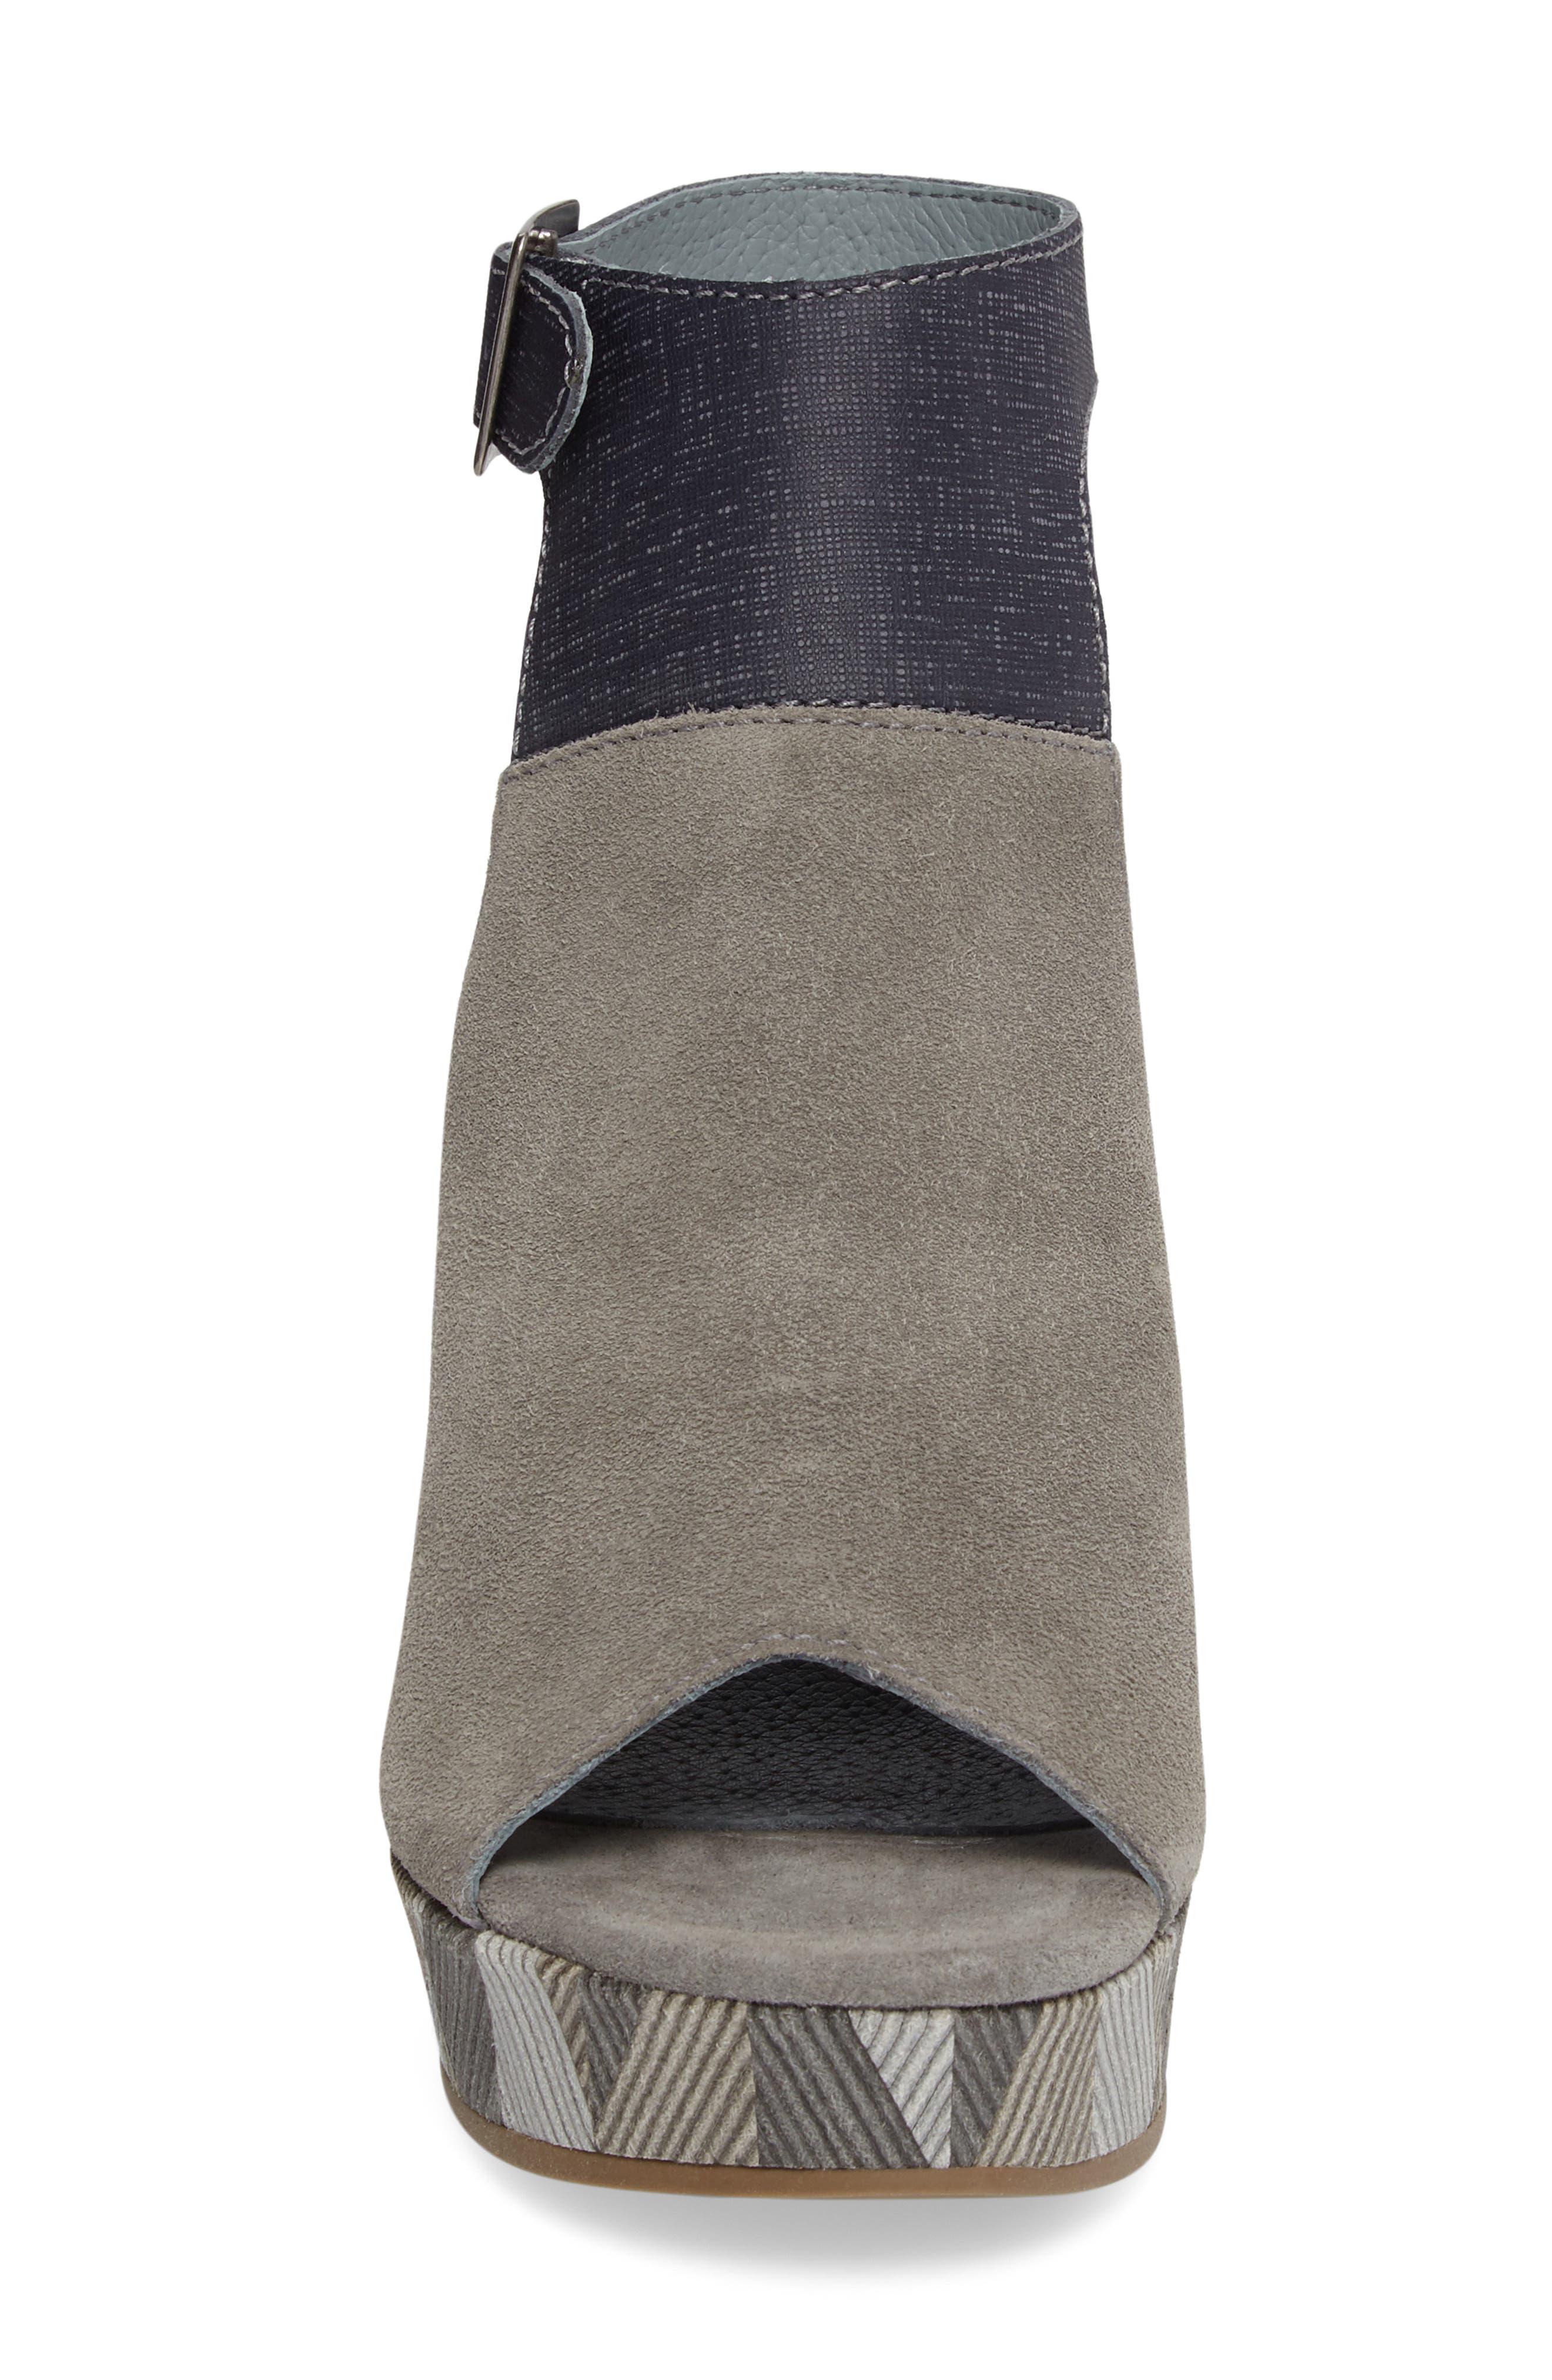 Harlequin Wedge Sandal,                             Alternate thumbnail 4, color,                             029